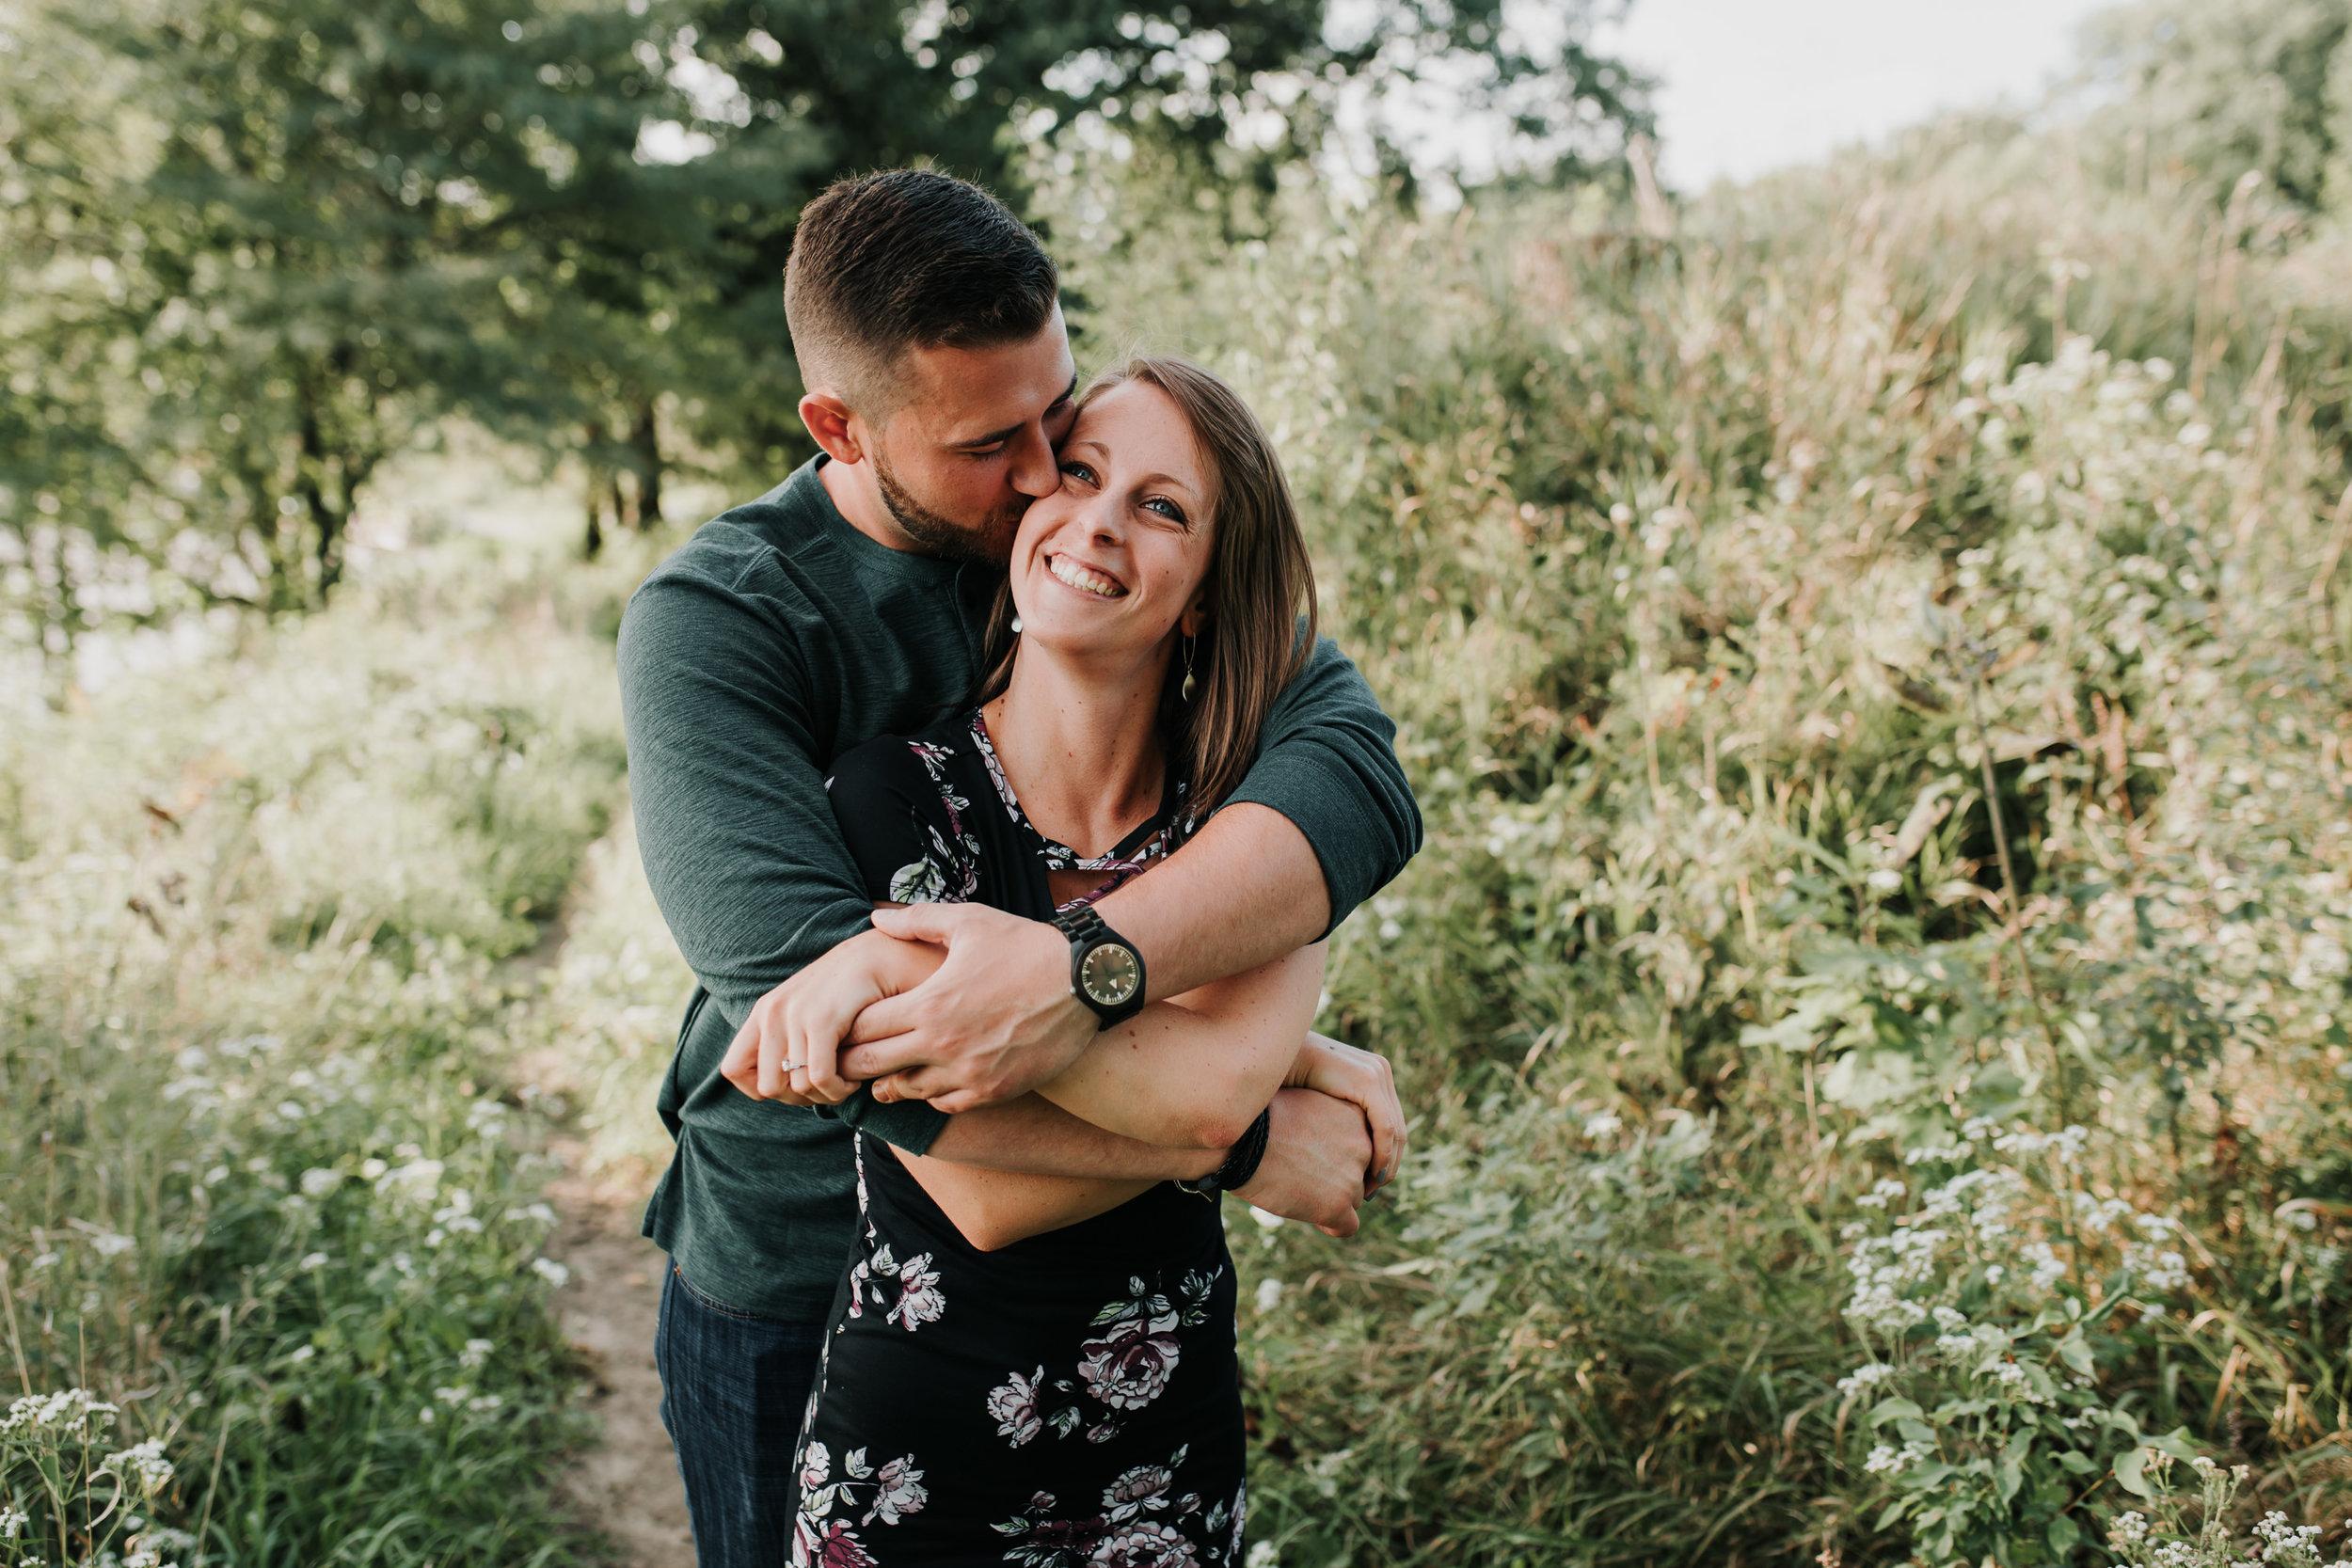 Leslie & Austin - Engaged - Nathaniel Jensen Photography - Omaha Nebraska Wedding Photograper - Engagement Session-4.jpg